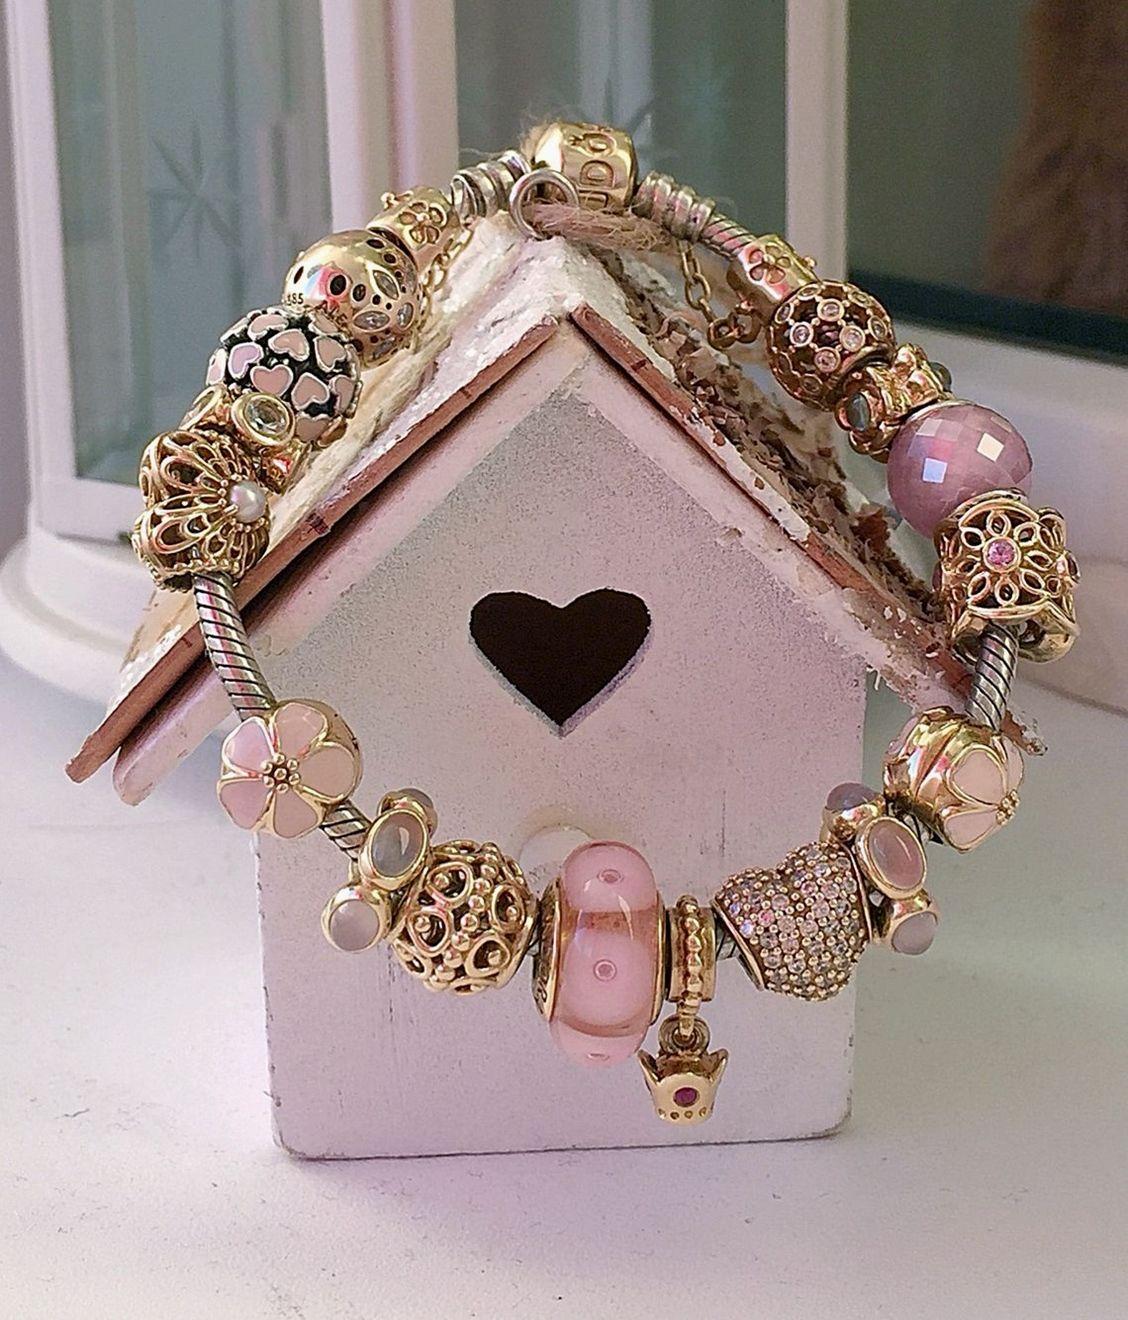 pandora usa sale   Pandora bracelet designs, Pandora jewelry ...